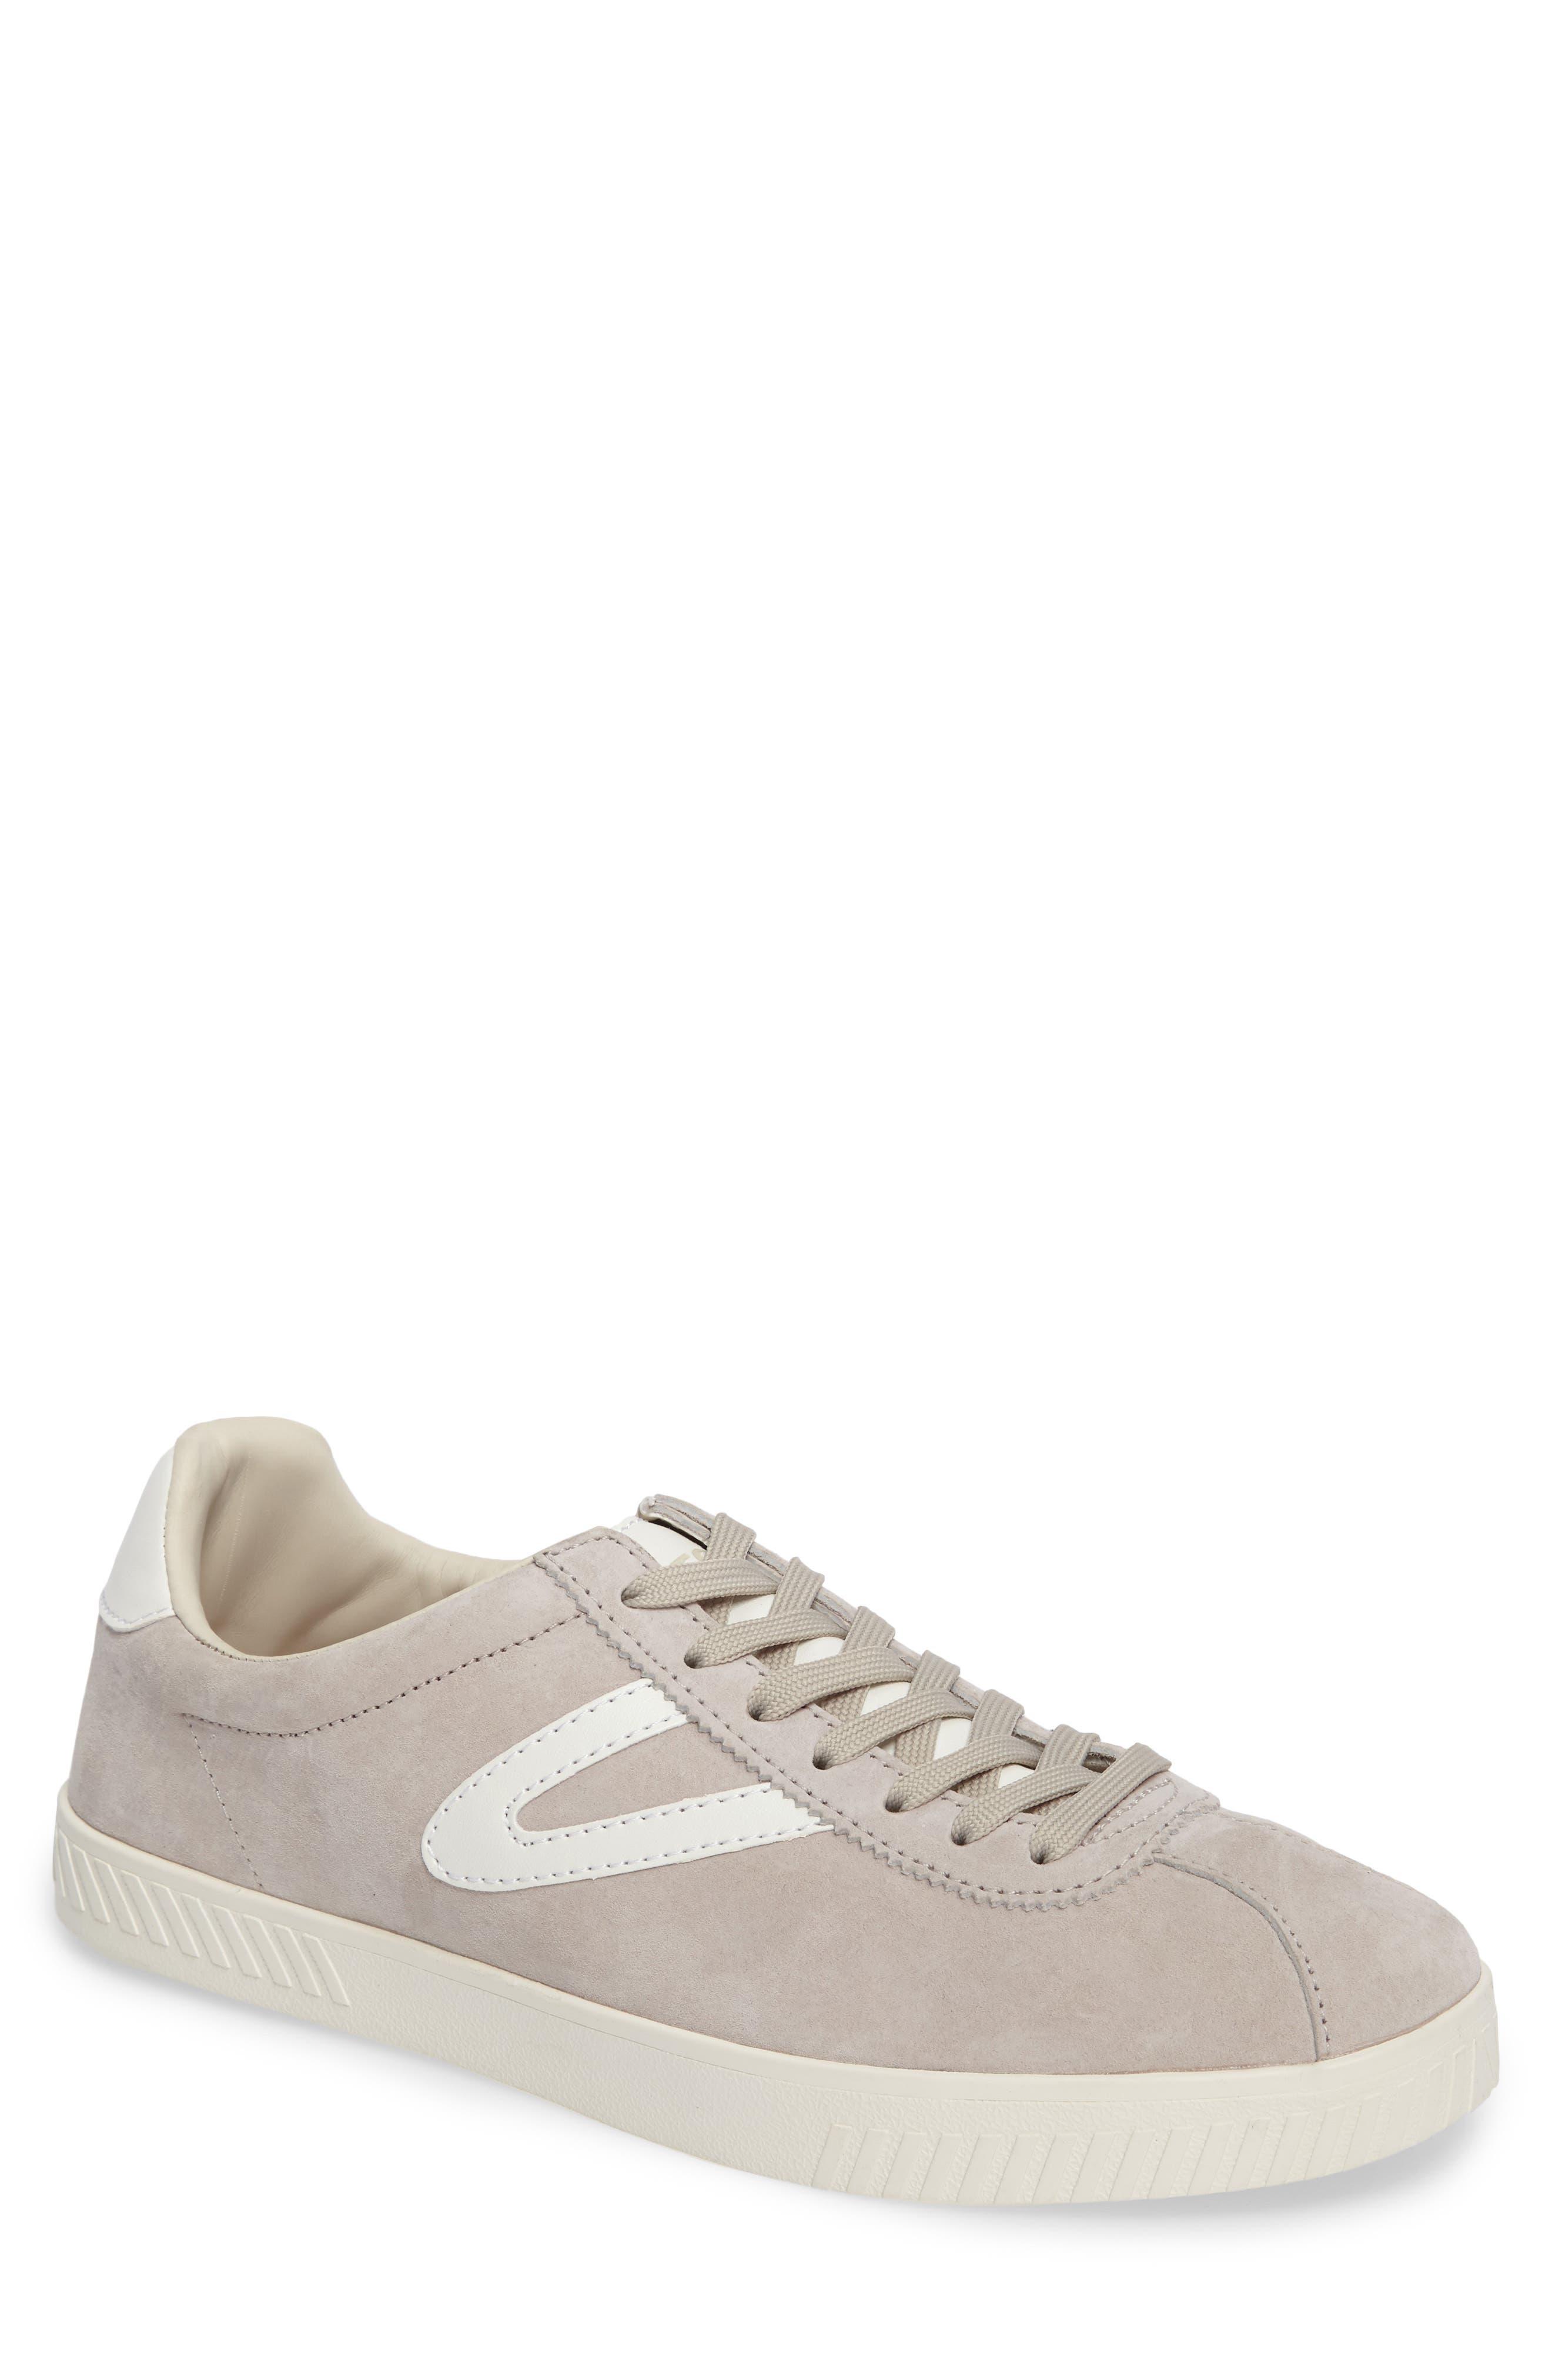 Camden 3 Sneaker,                         Main,                         color, Birch/ White Nubuck